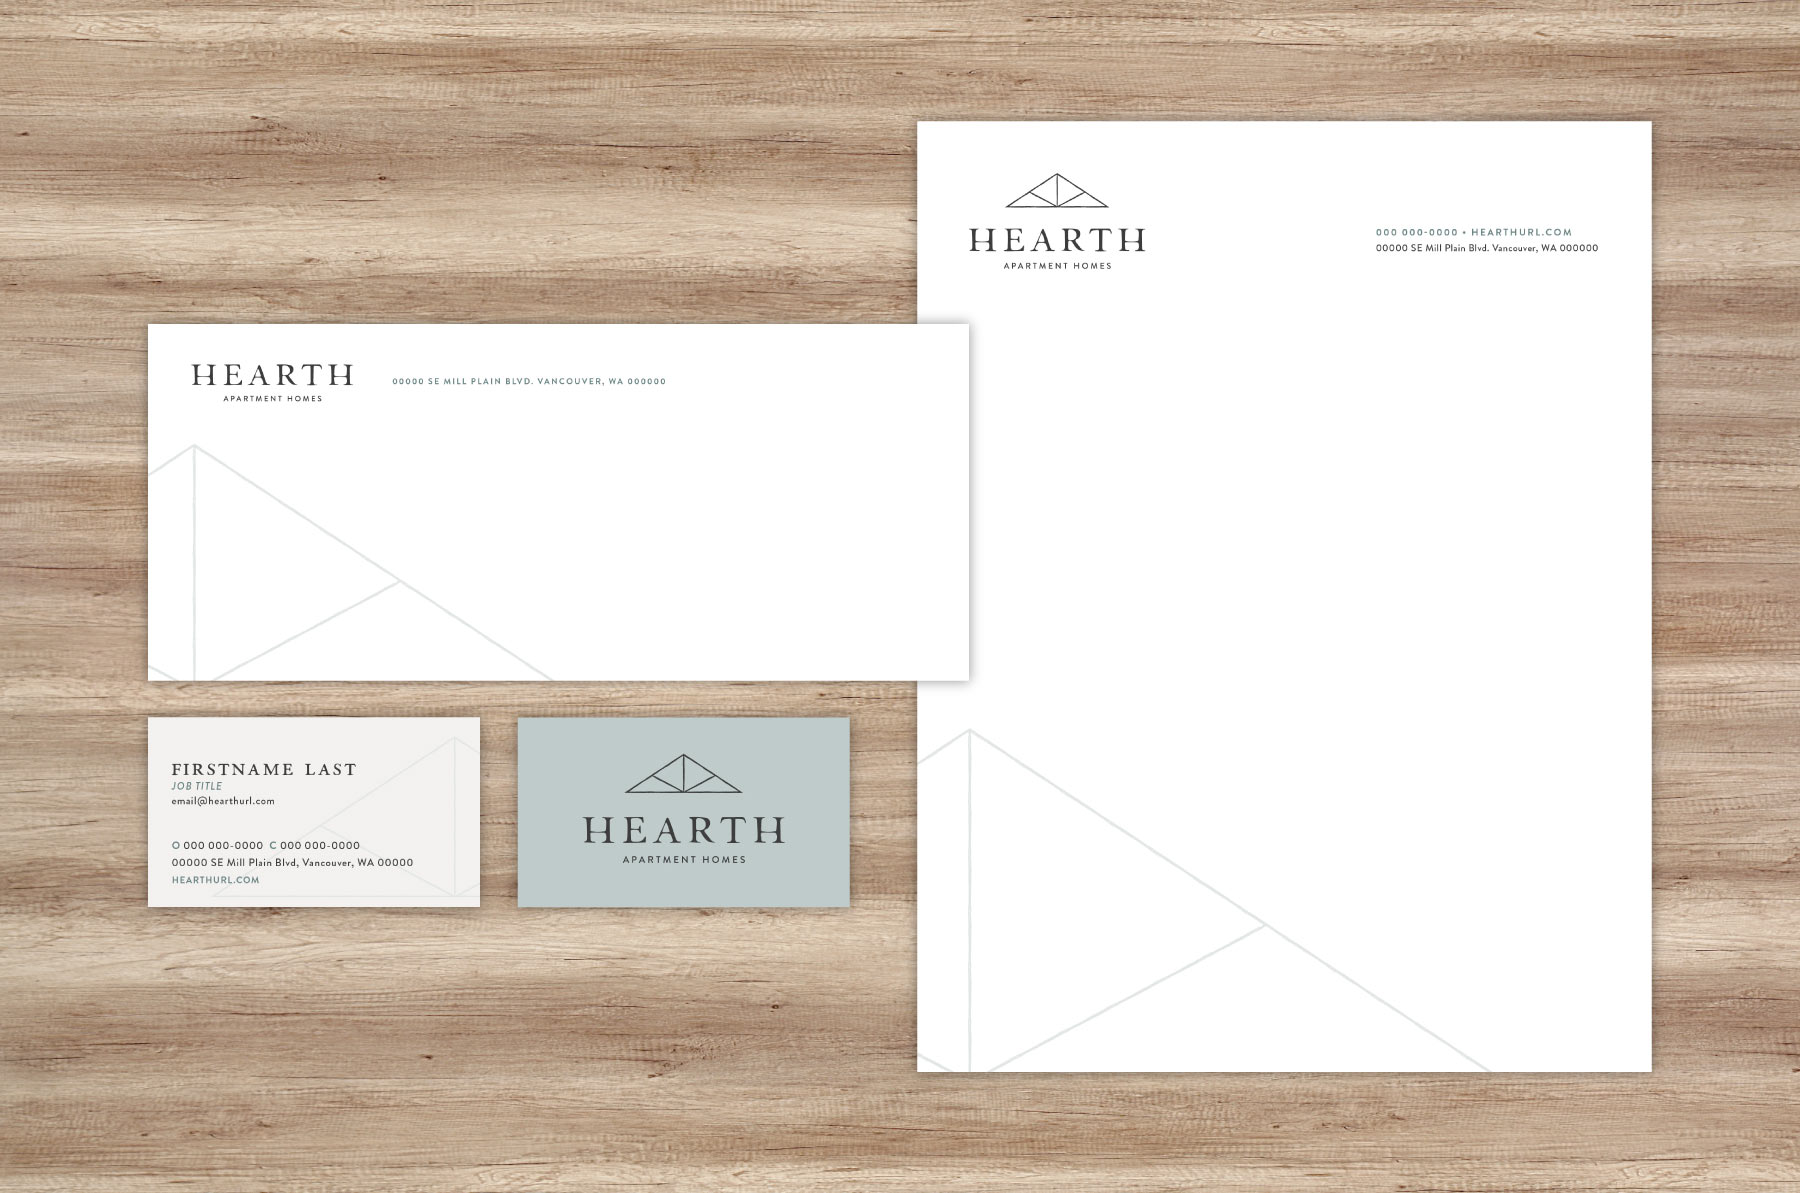 Hearth-Stationery.jpg